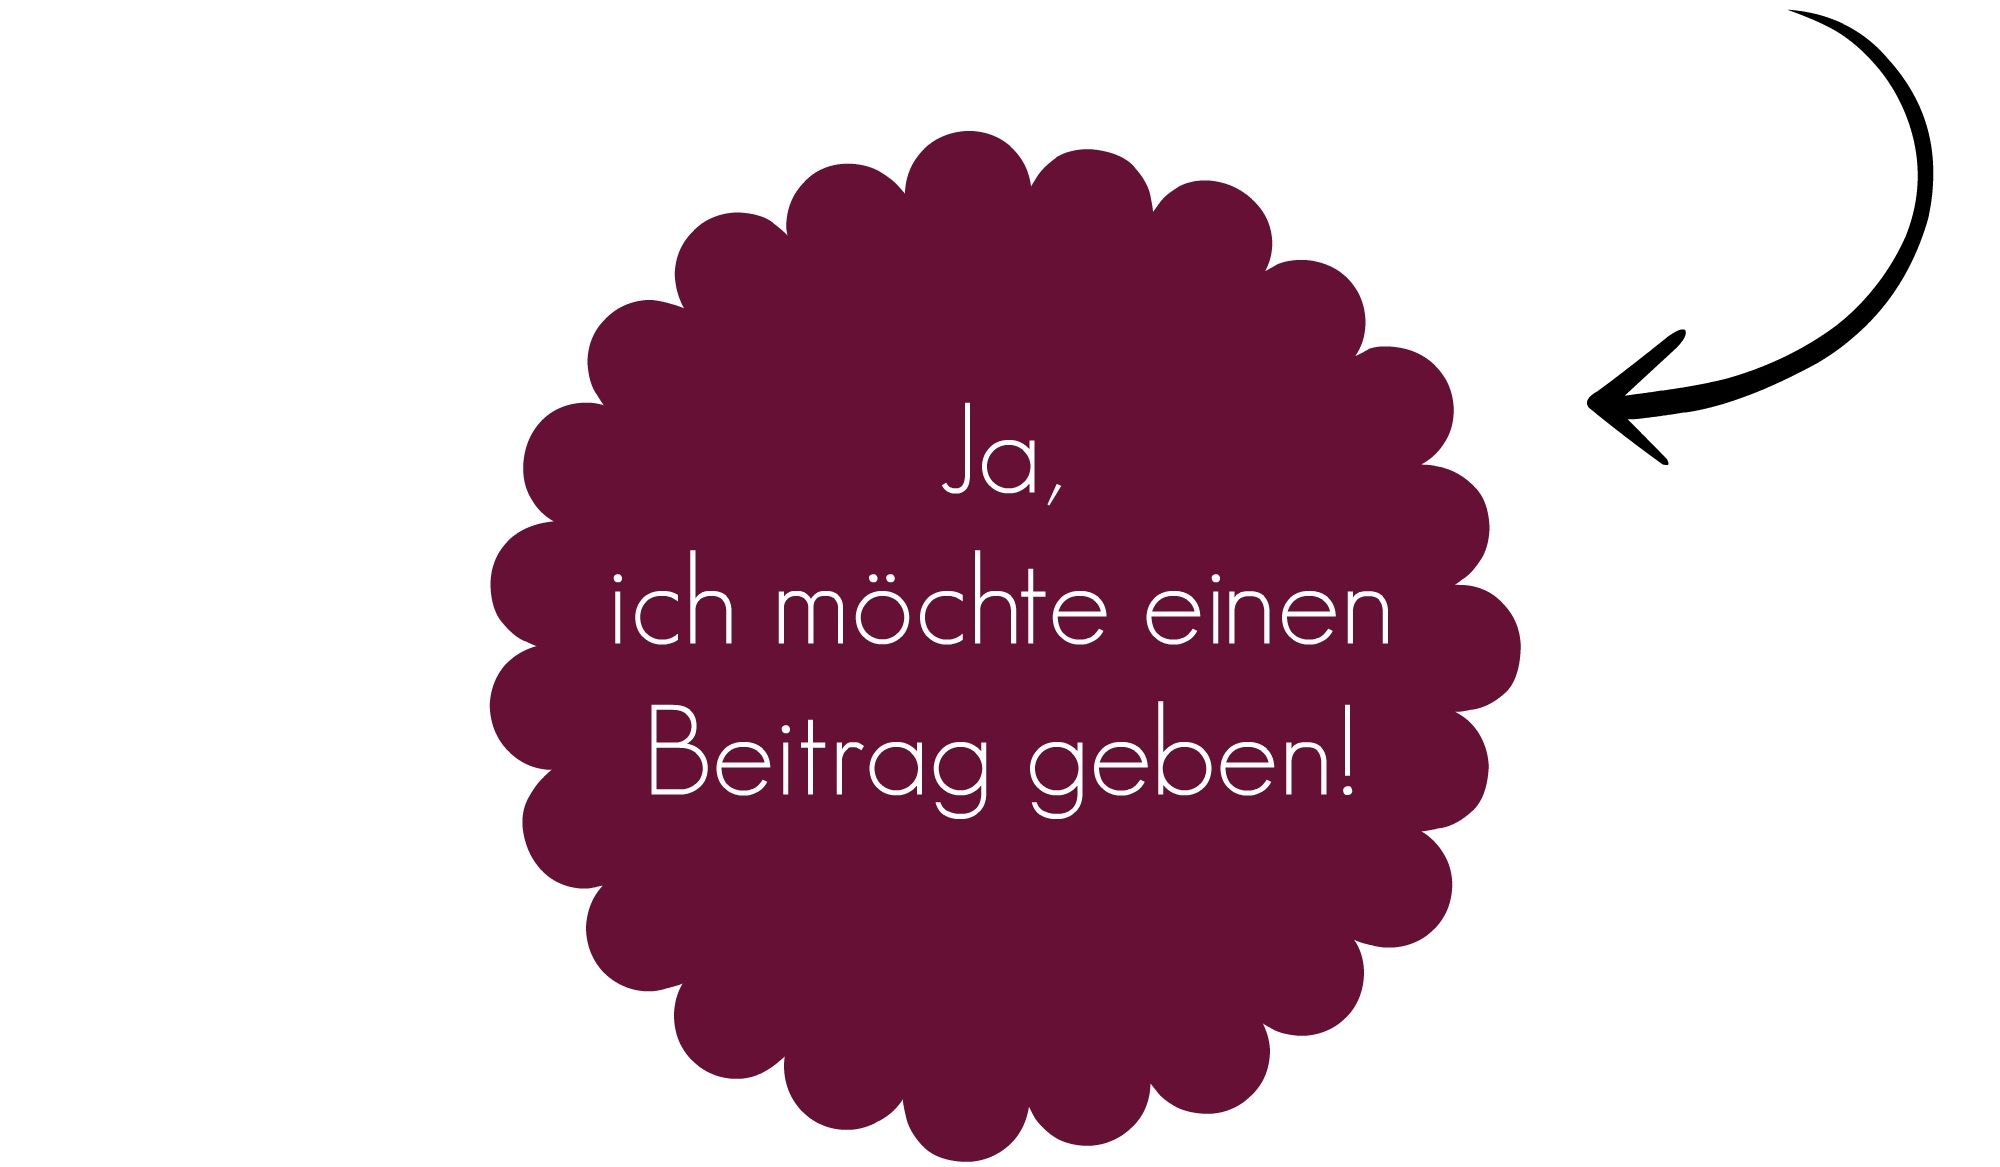 https://www.sabrinagundert.de/wp-content/uploads/2017/01/beitrag2_.jpg